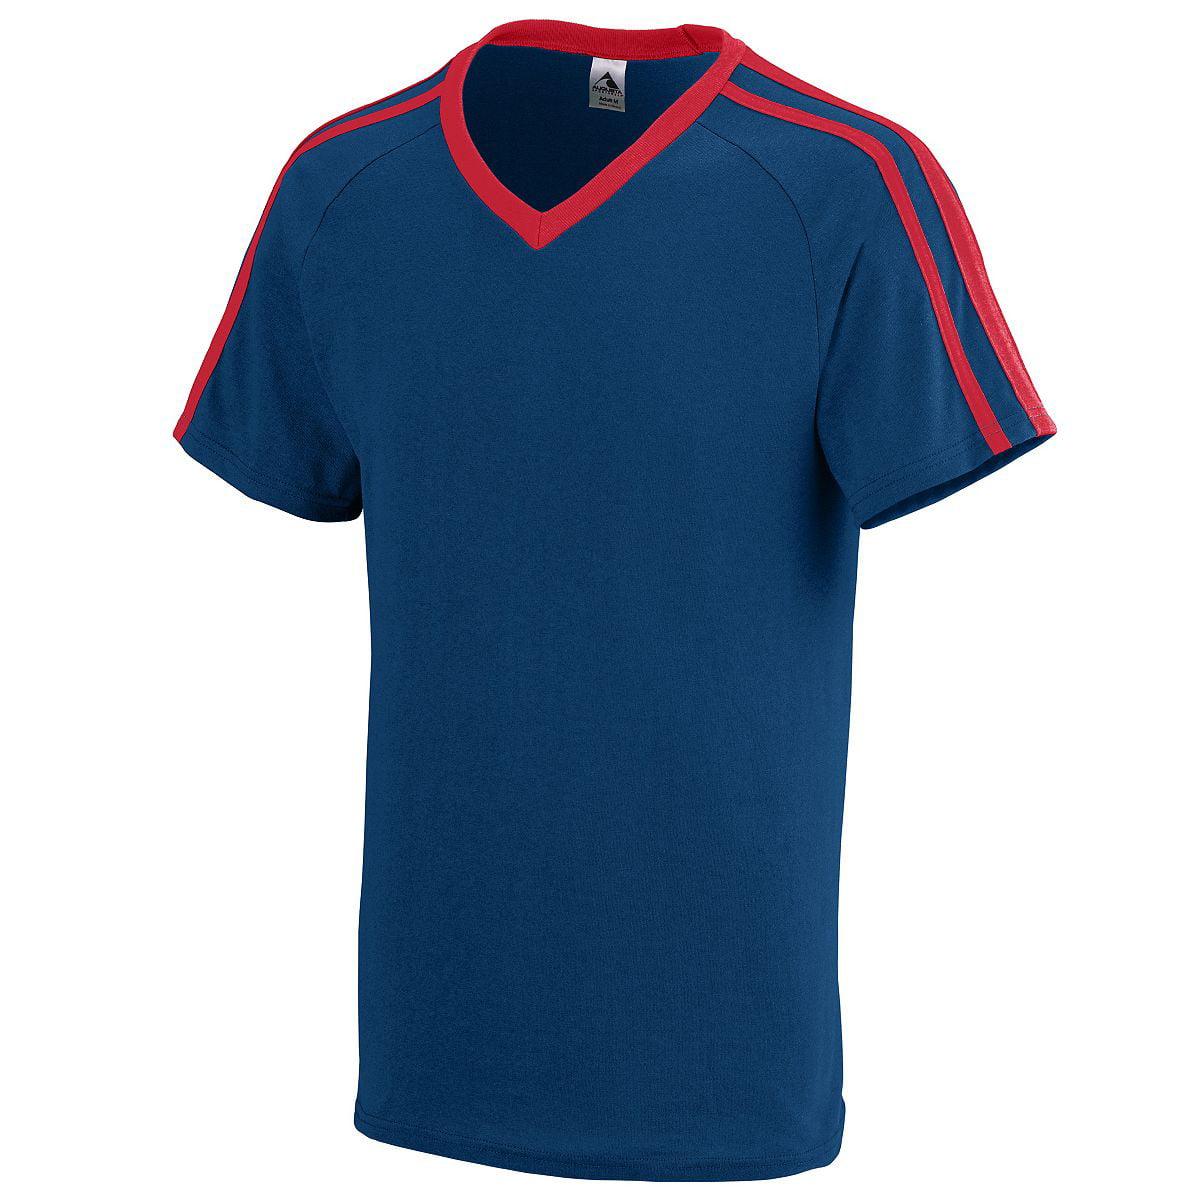 Augusta Sportswear Men's Get Rowdy Shoulder Stripe Tee 2Xl Navy/Red - image 1 of 1